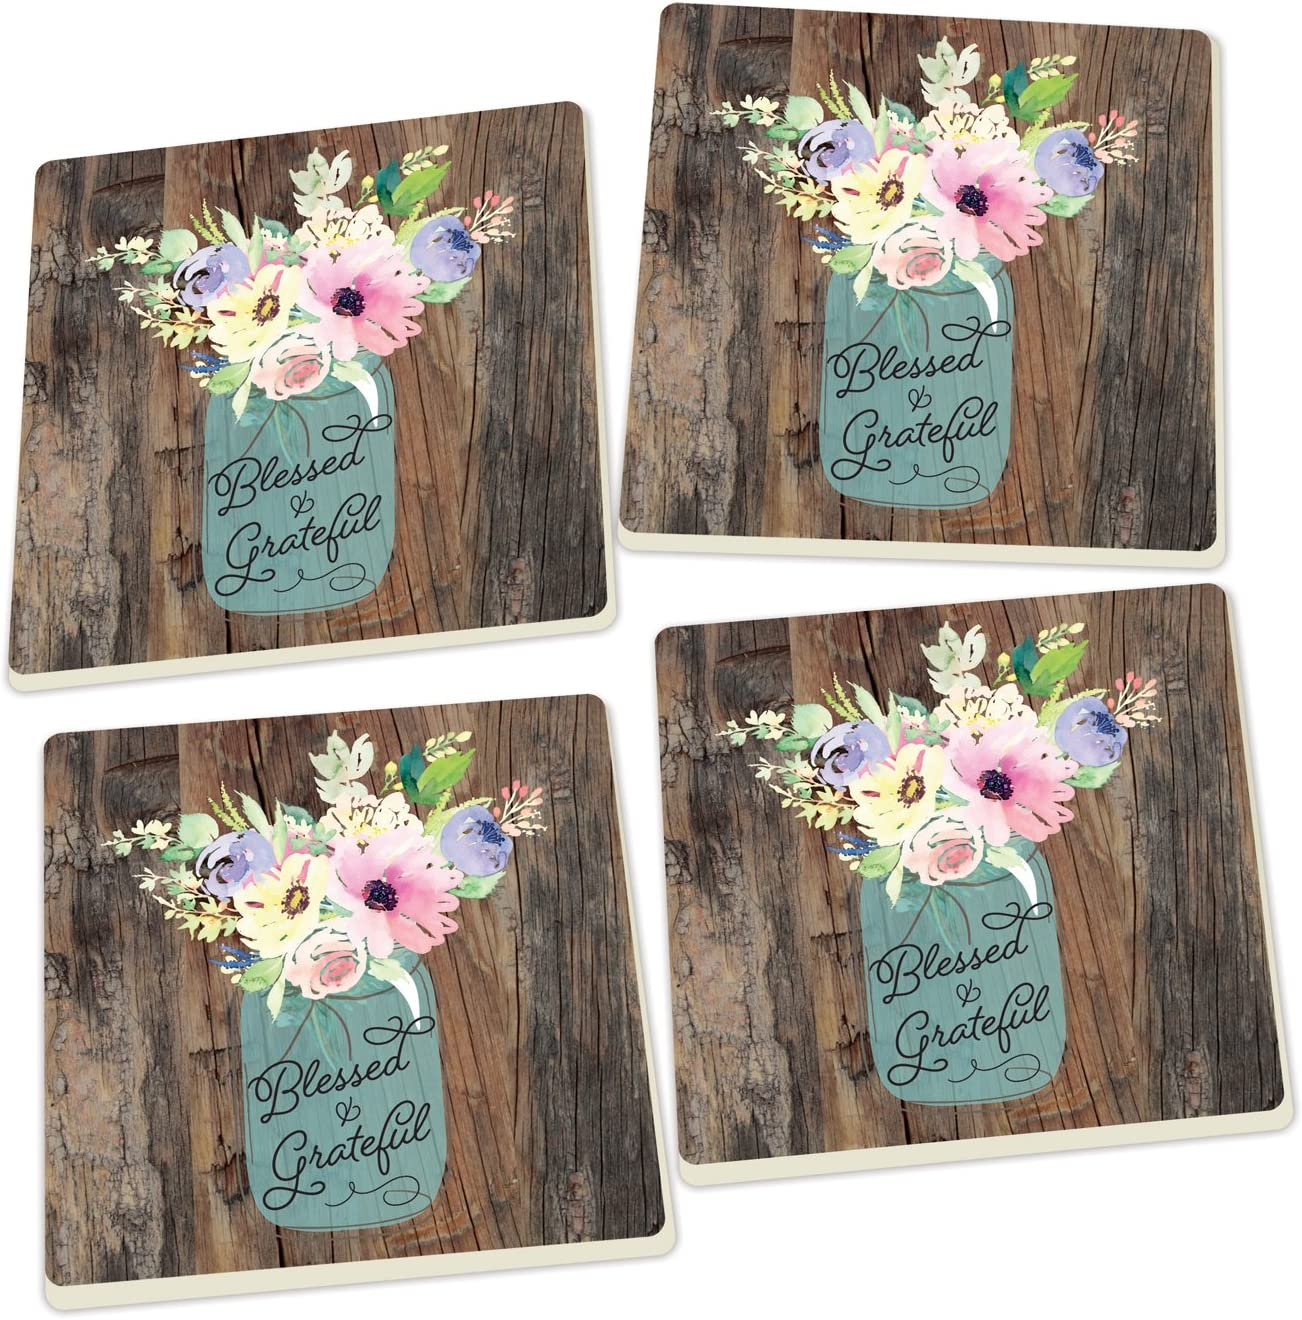 Blessed & Grateful Floral Mason Jar Wood Look 4 x 4 Absorbent Ceramic Coasters Set of 4